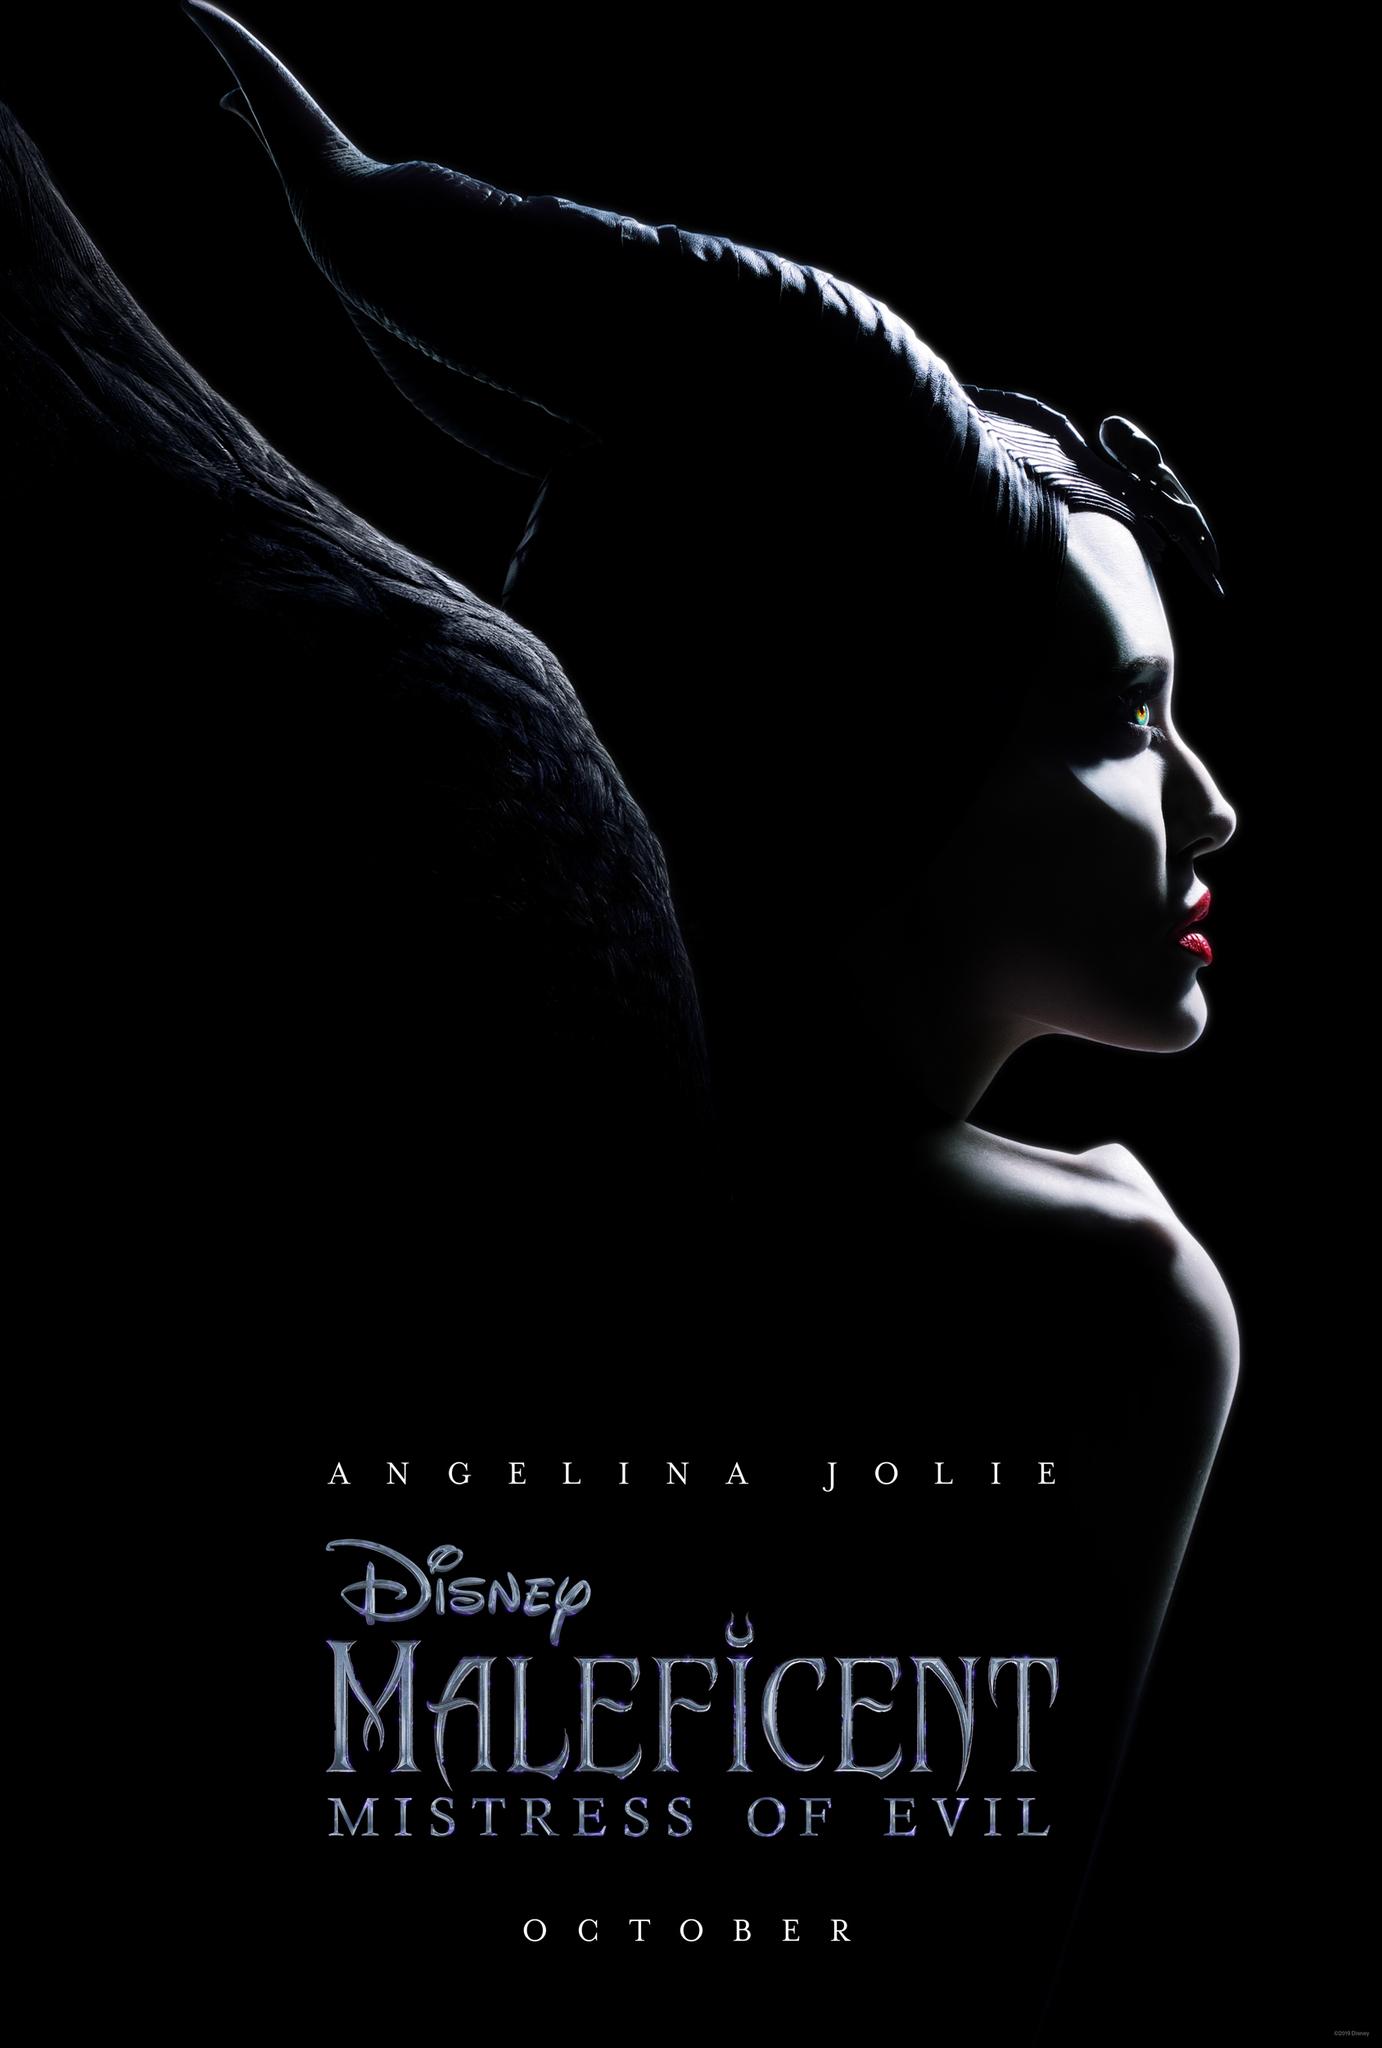 Maleficent 2 Teaser Poster